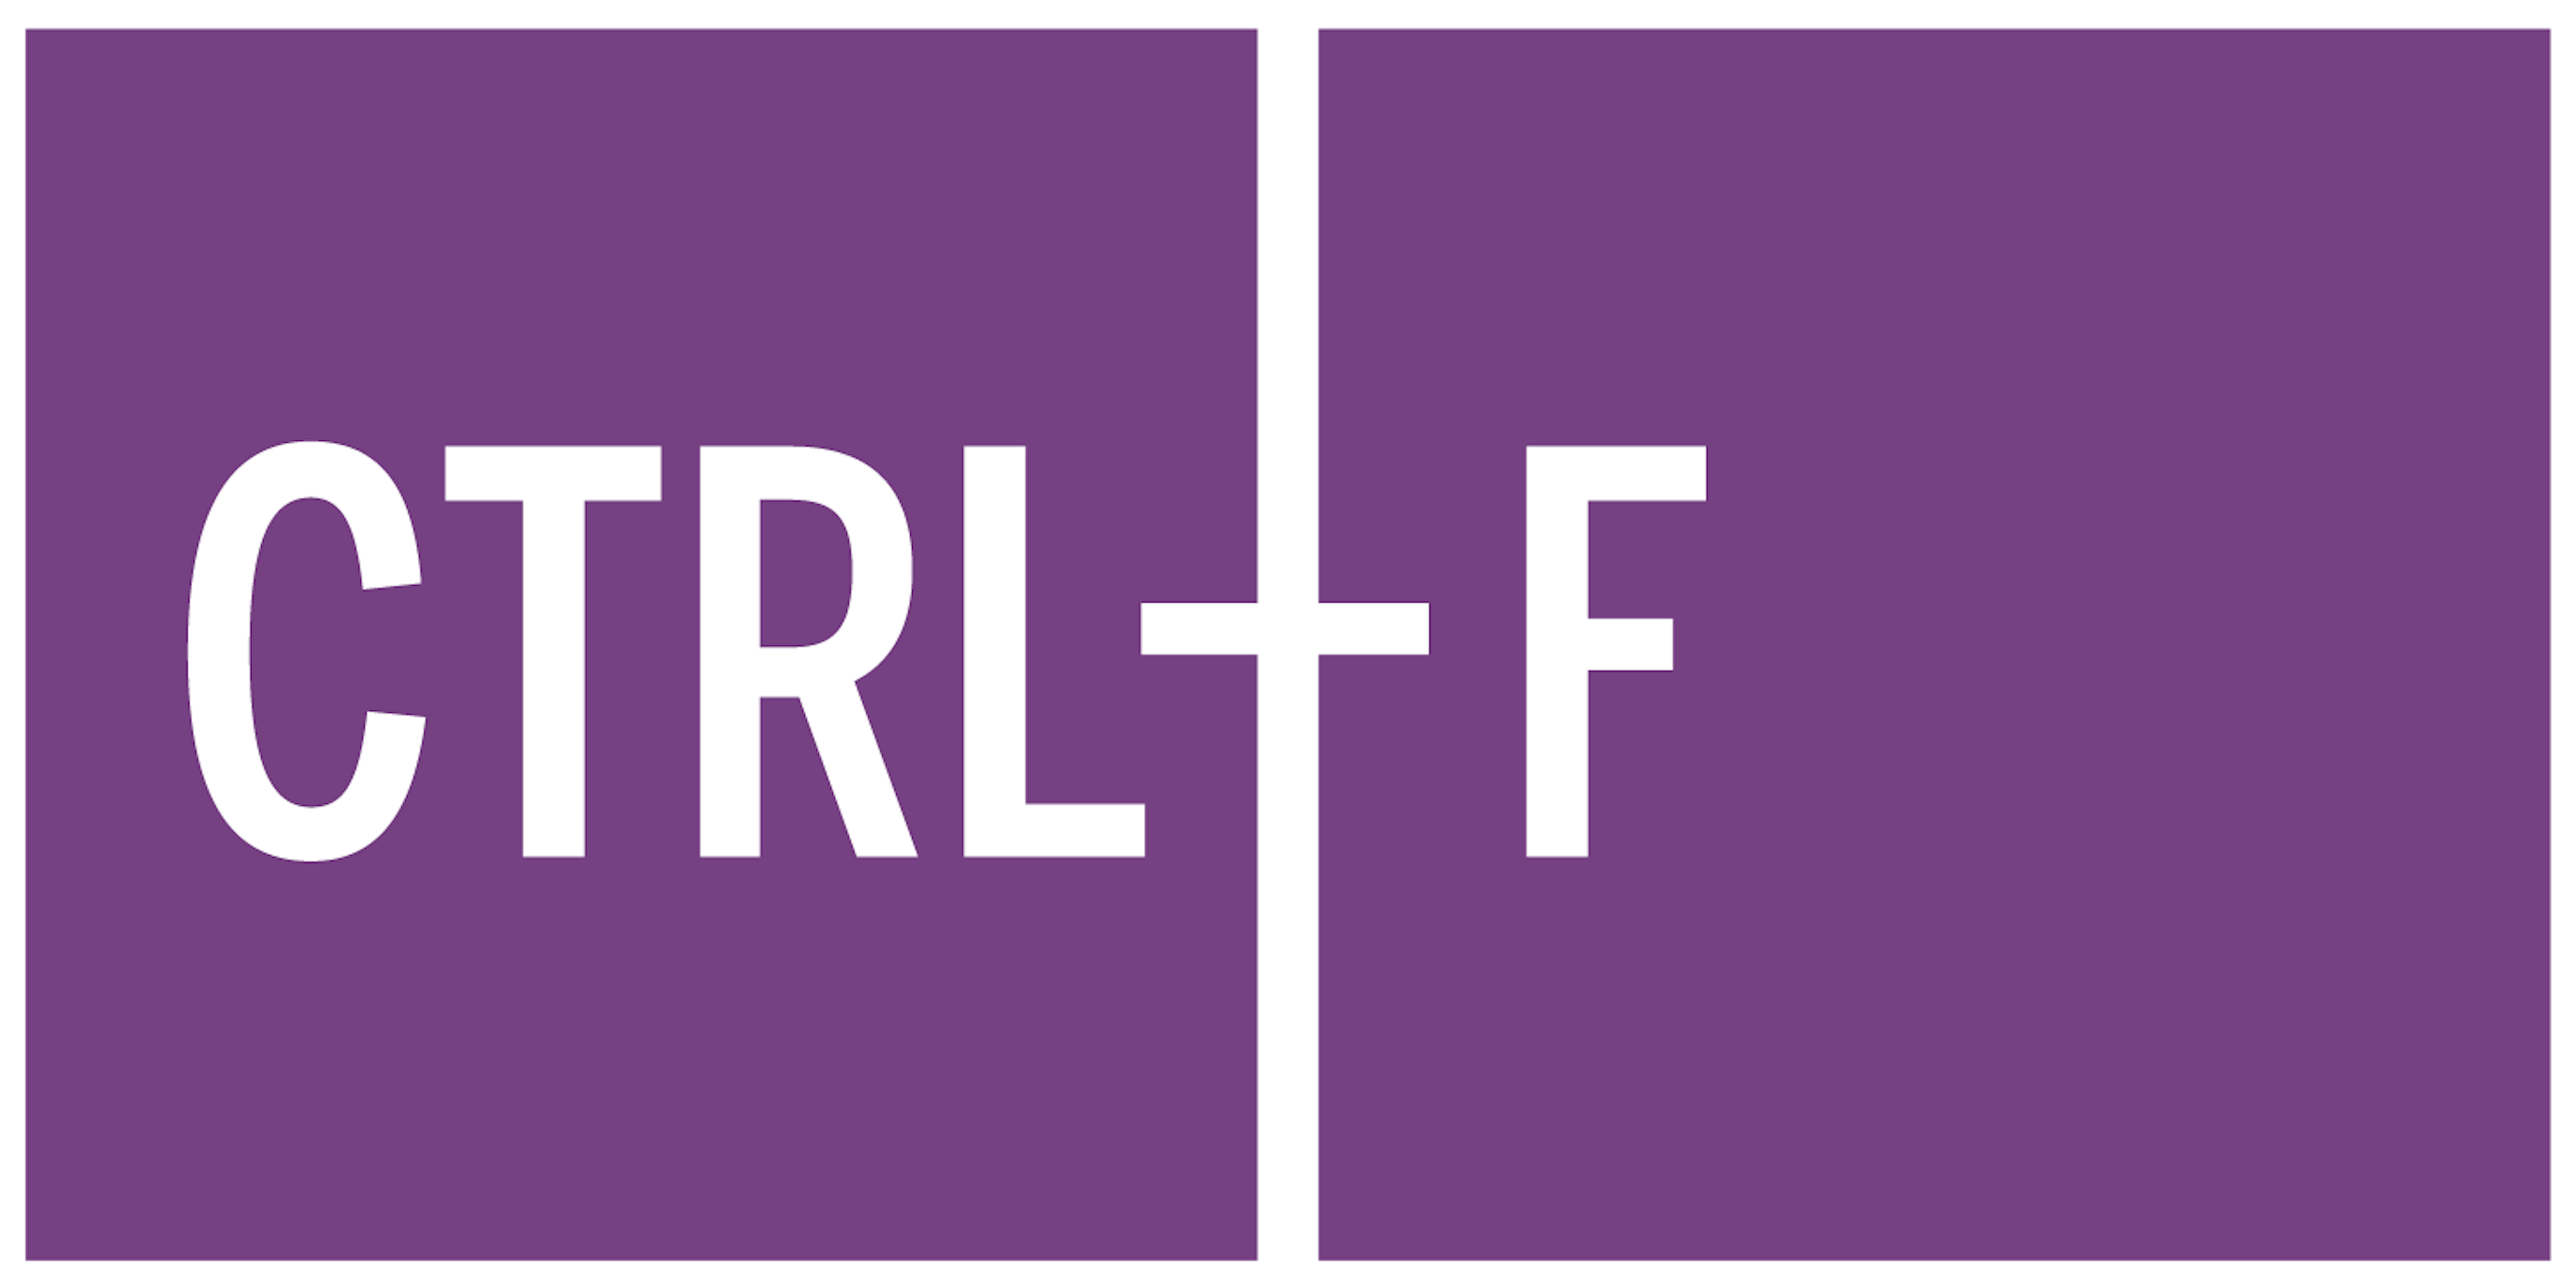 CTRL-F